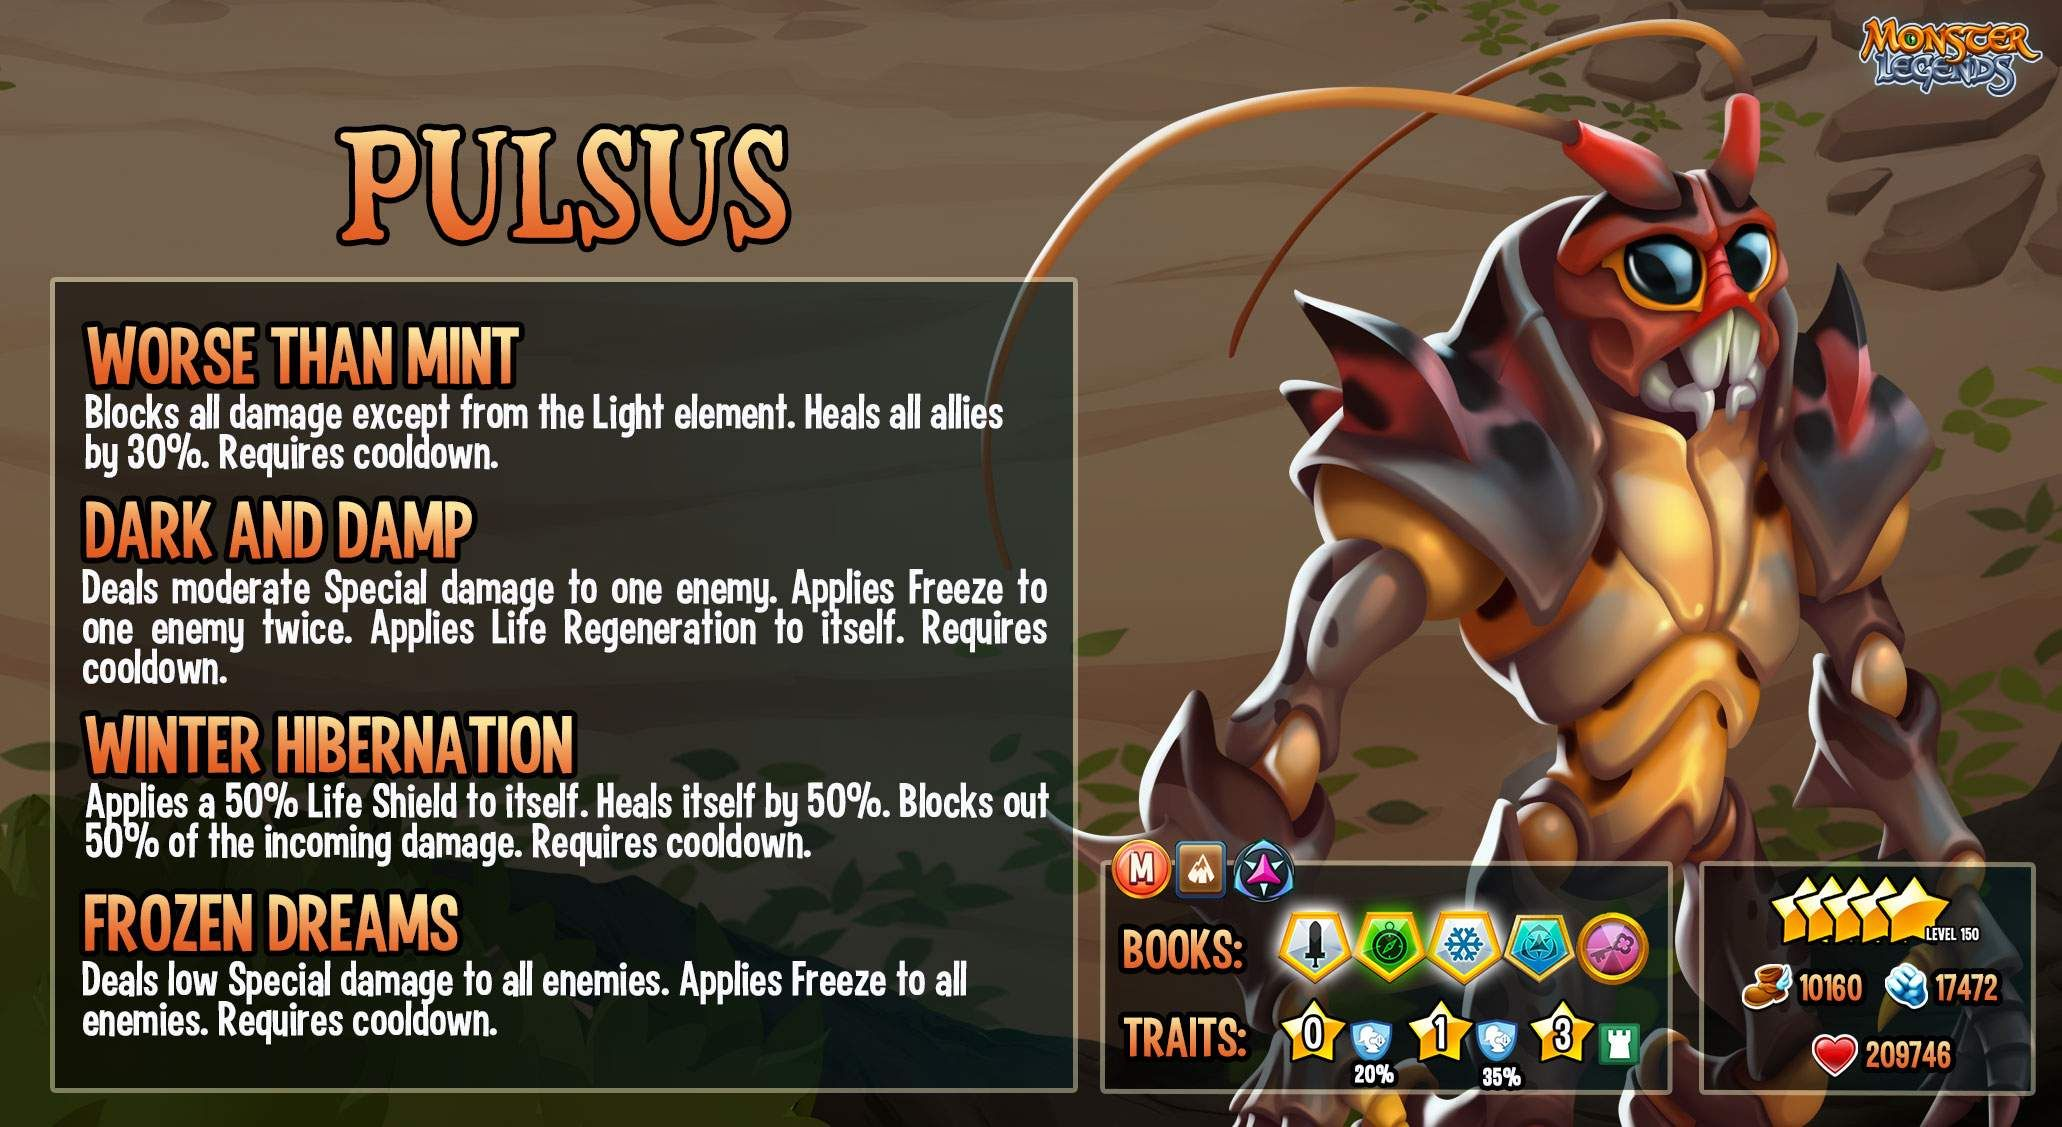 0_1600780593119_Pulsus.jpg